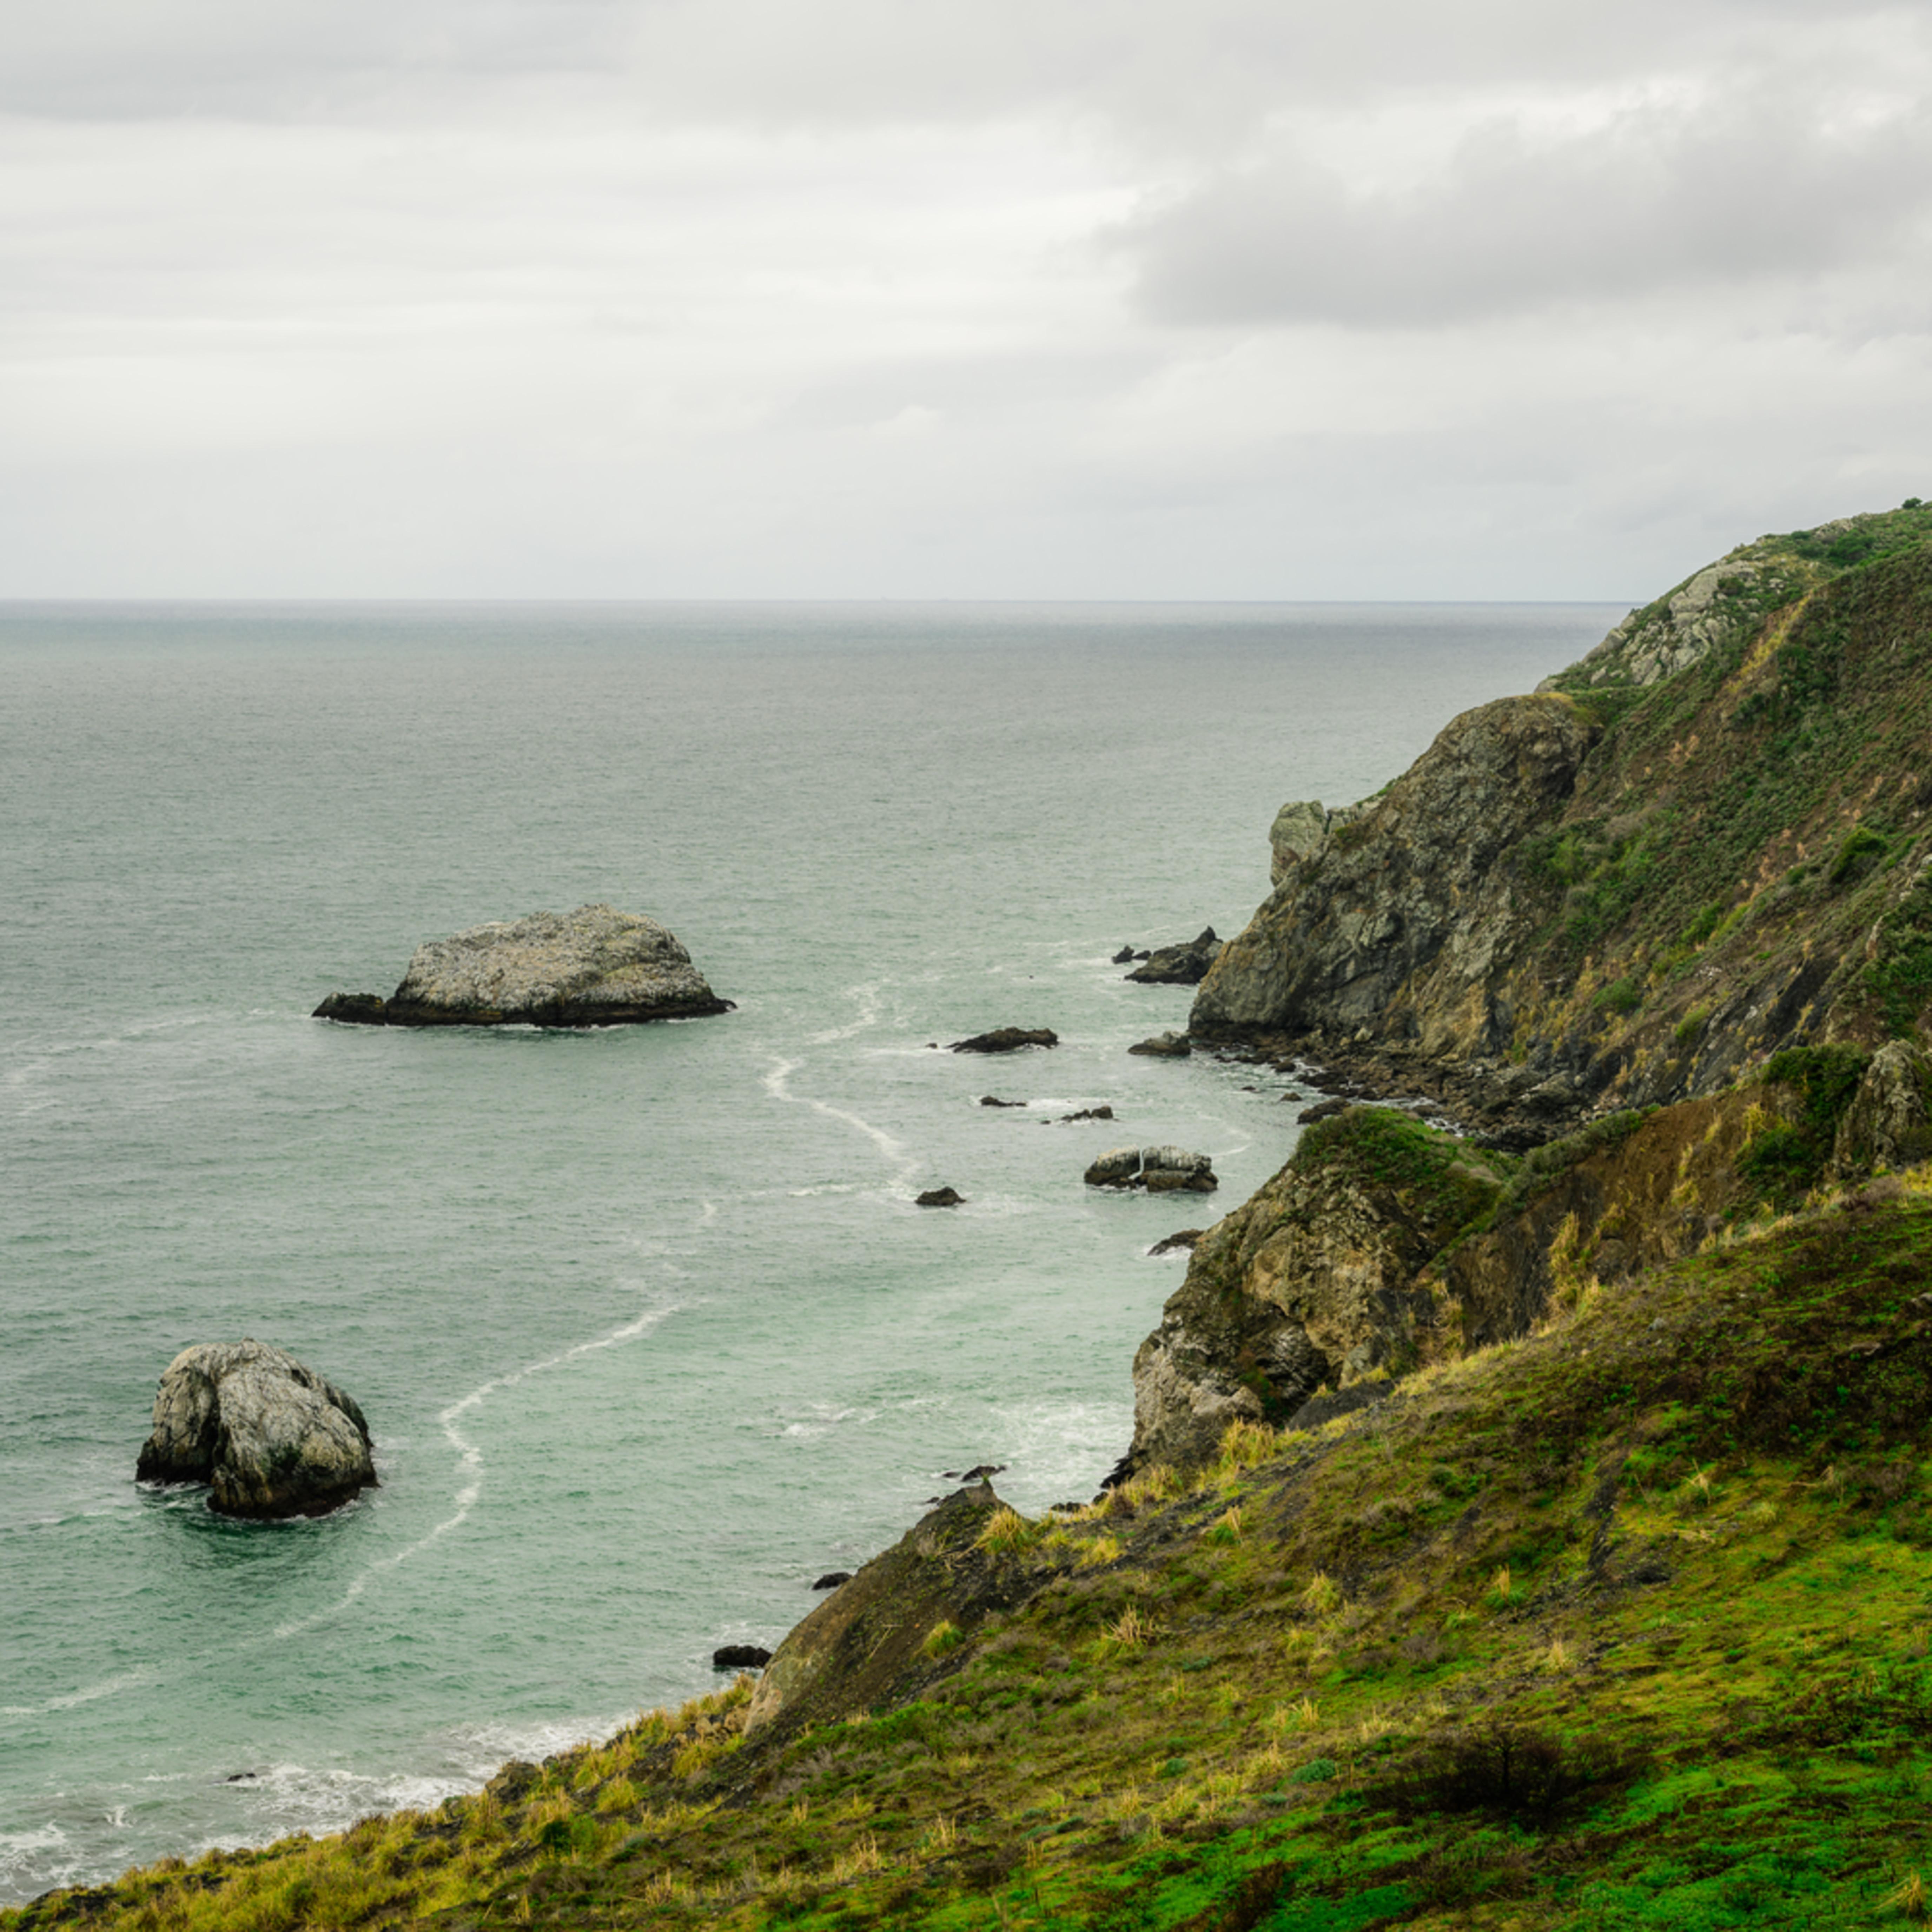 Gull rock shoreline highway california 2020 lgrqqb